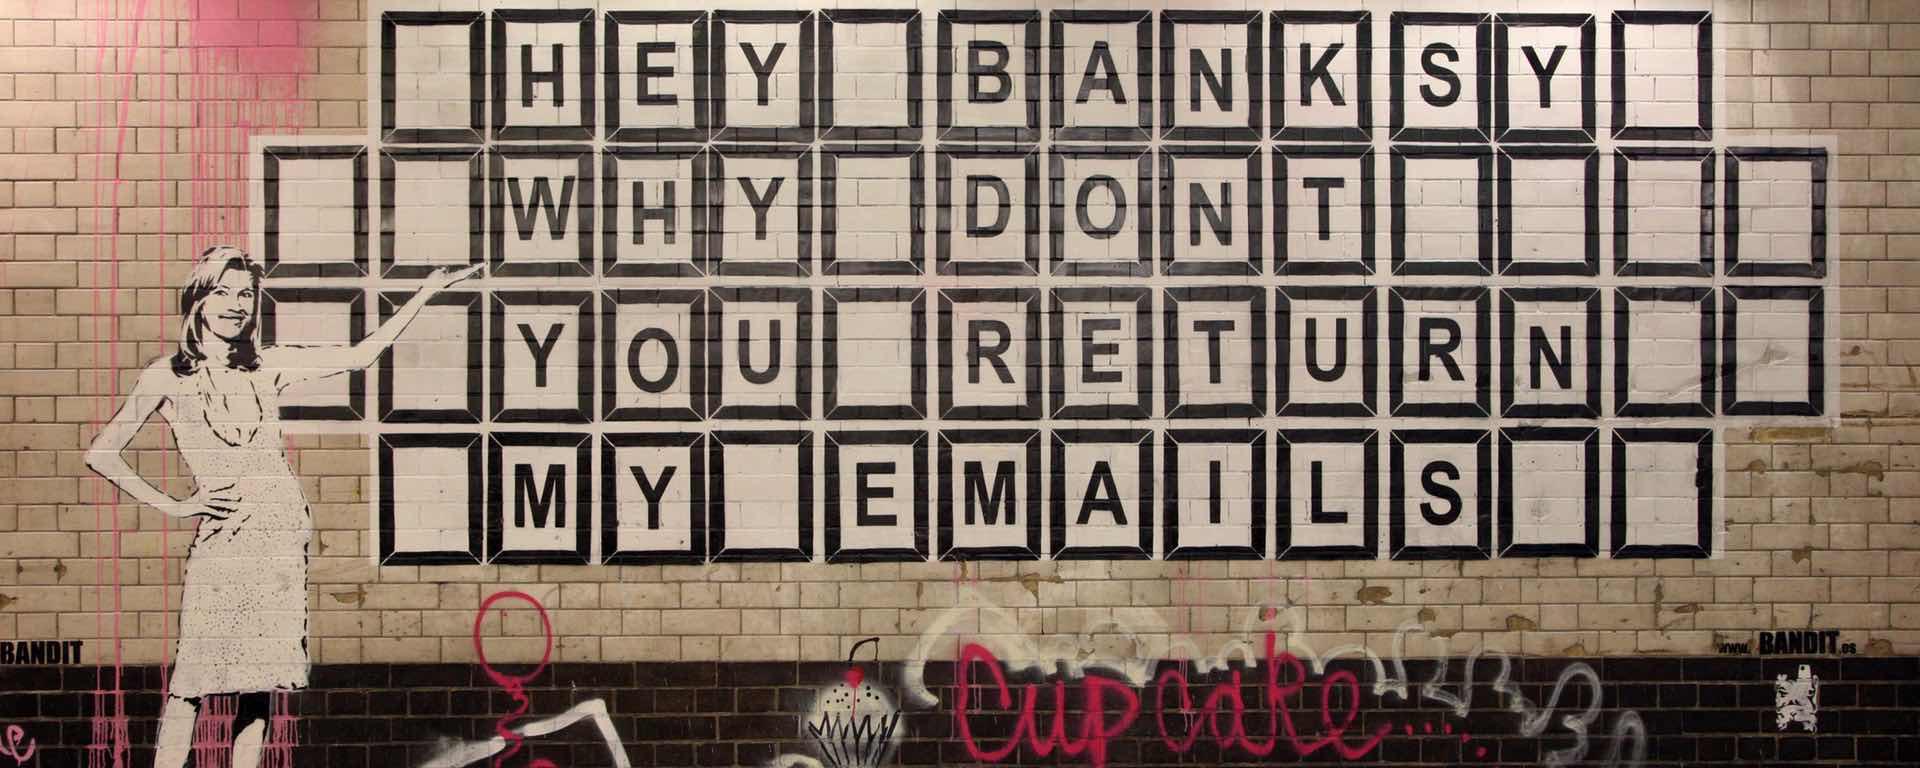 hey-banksy